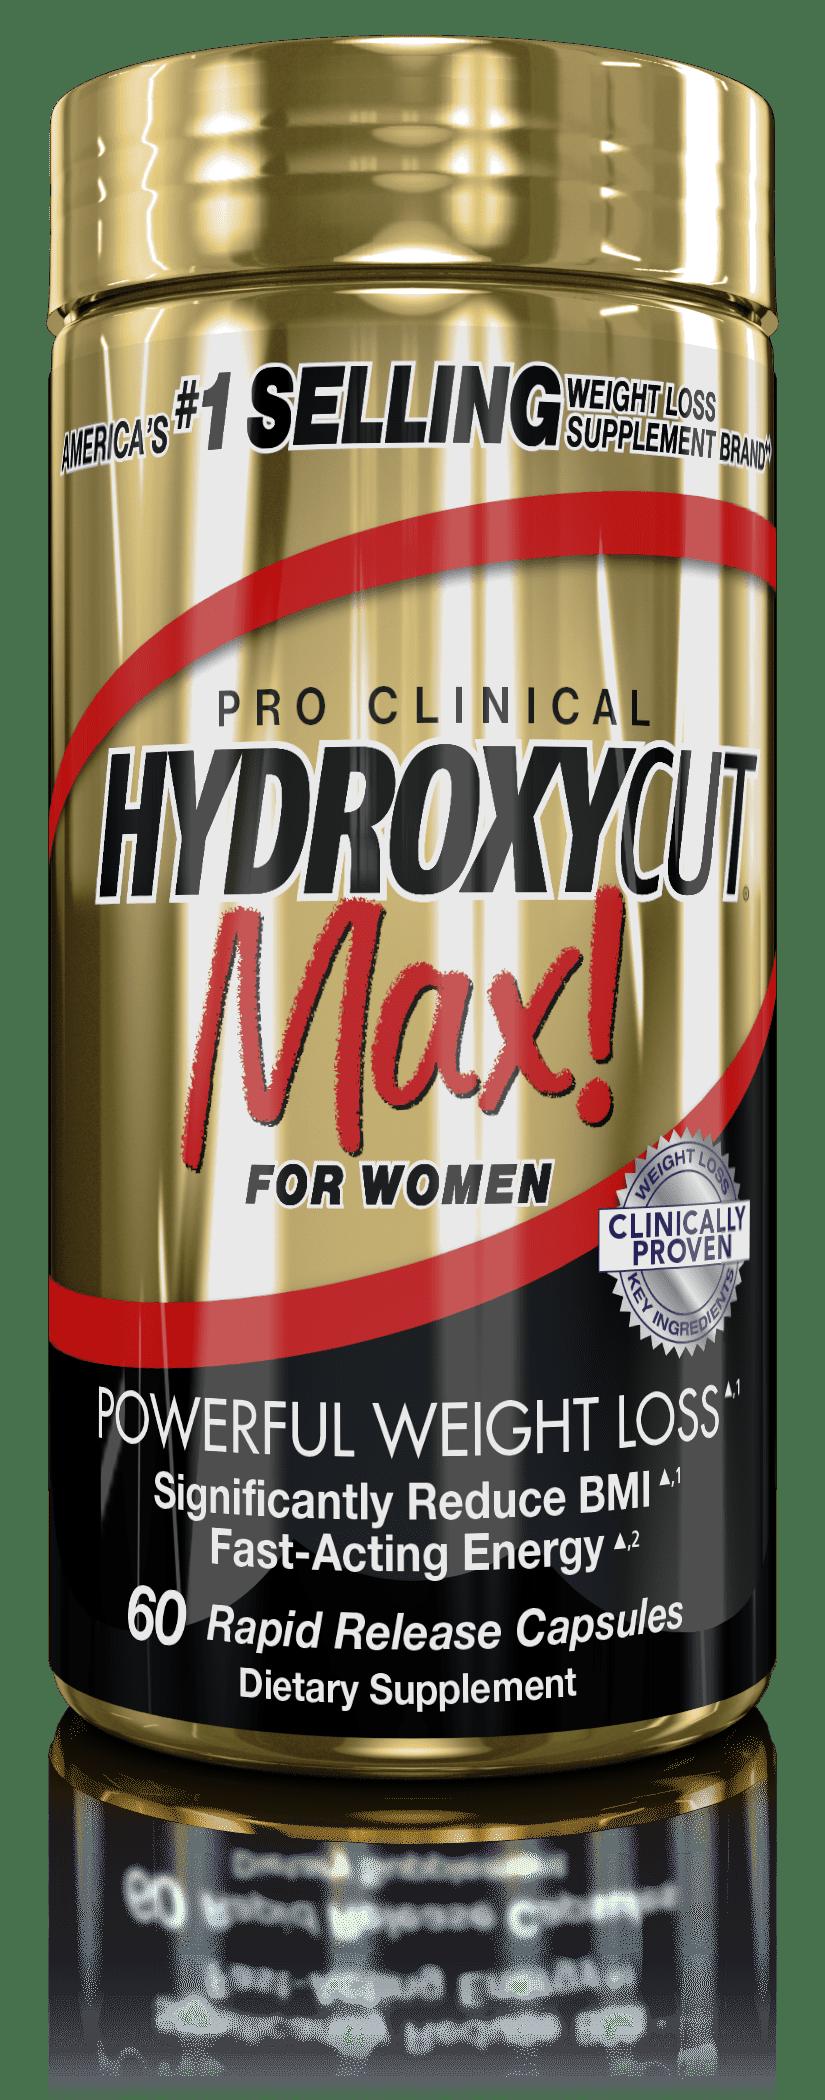 Diet max fat burning formula photo 10